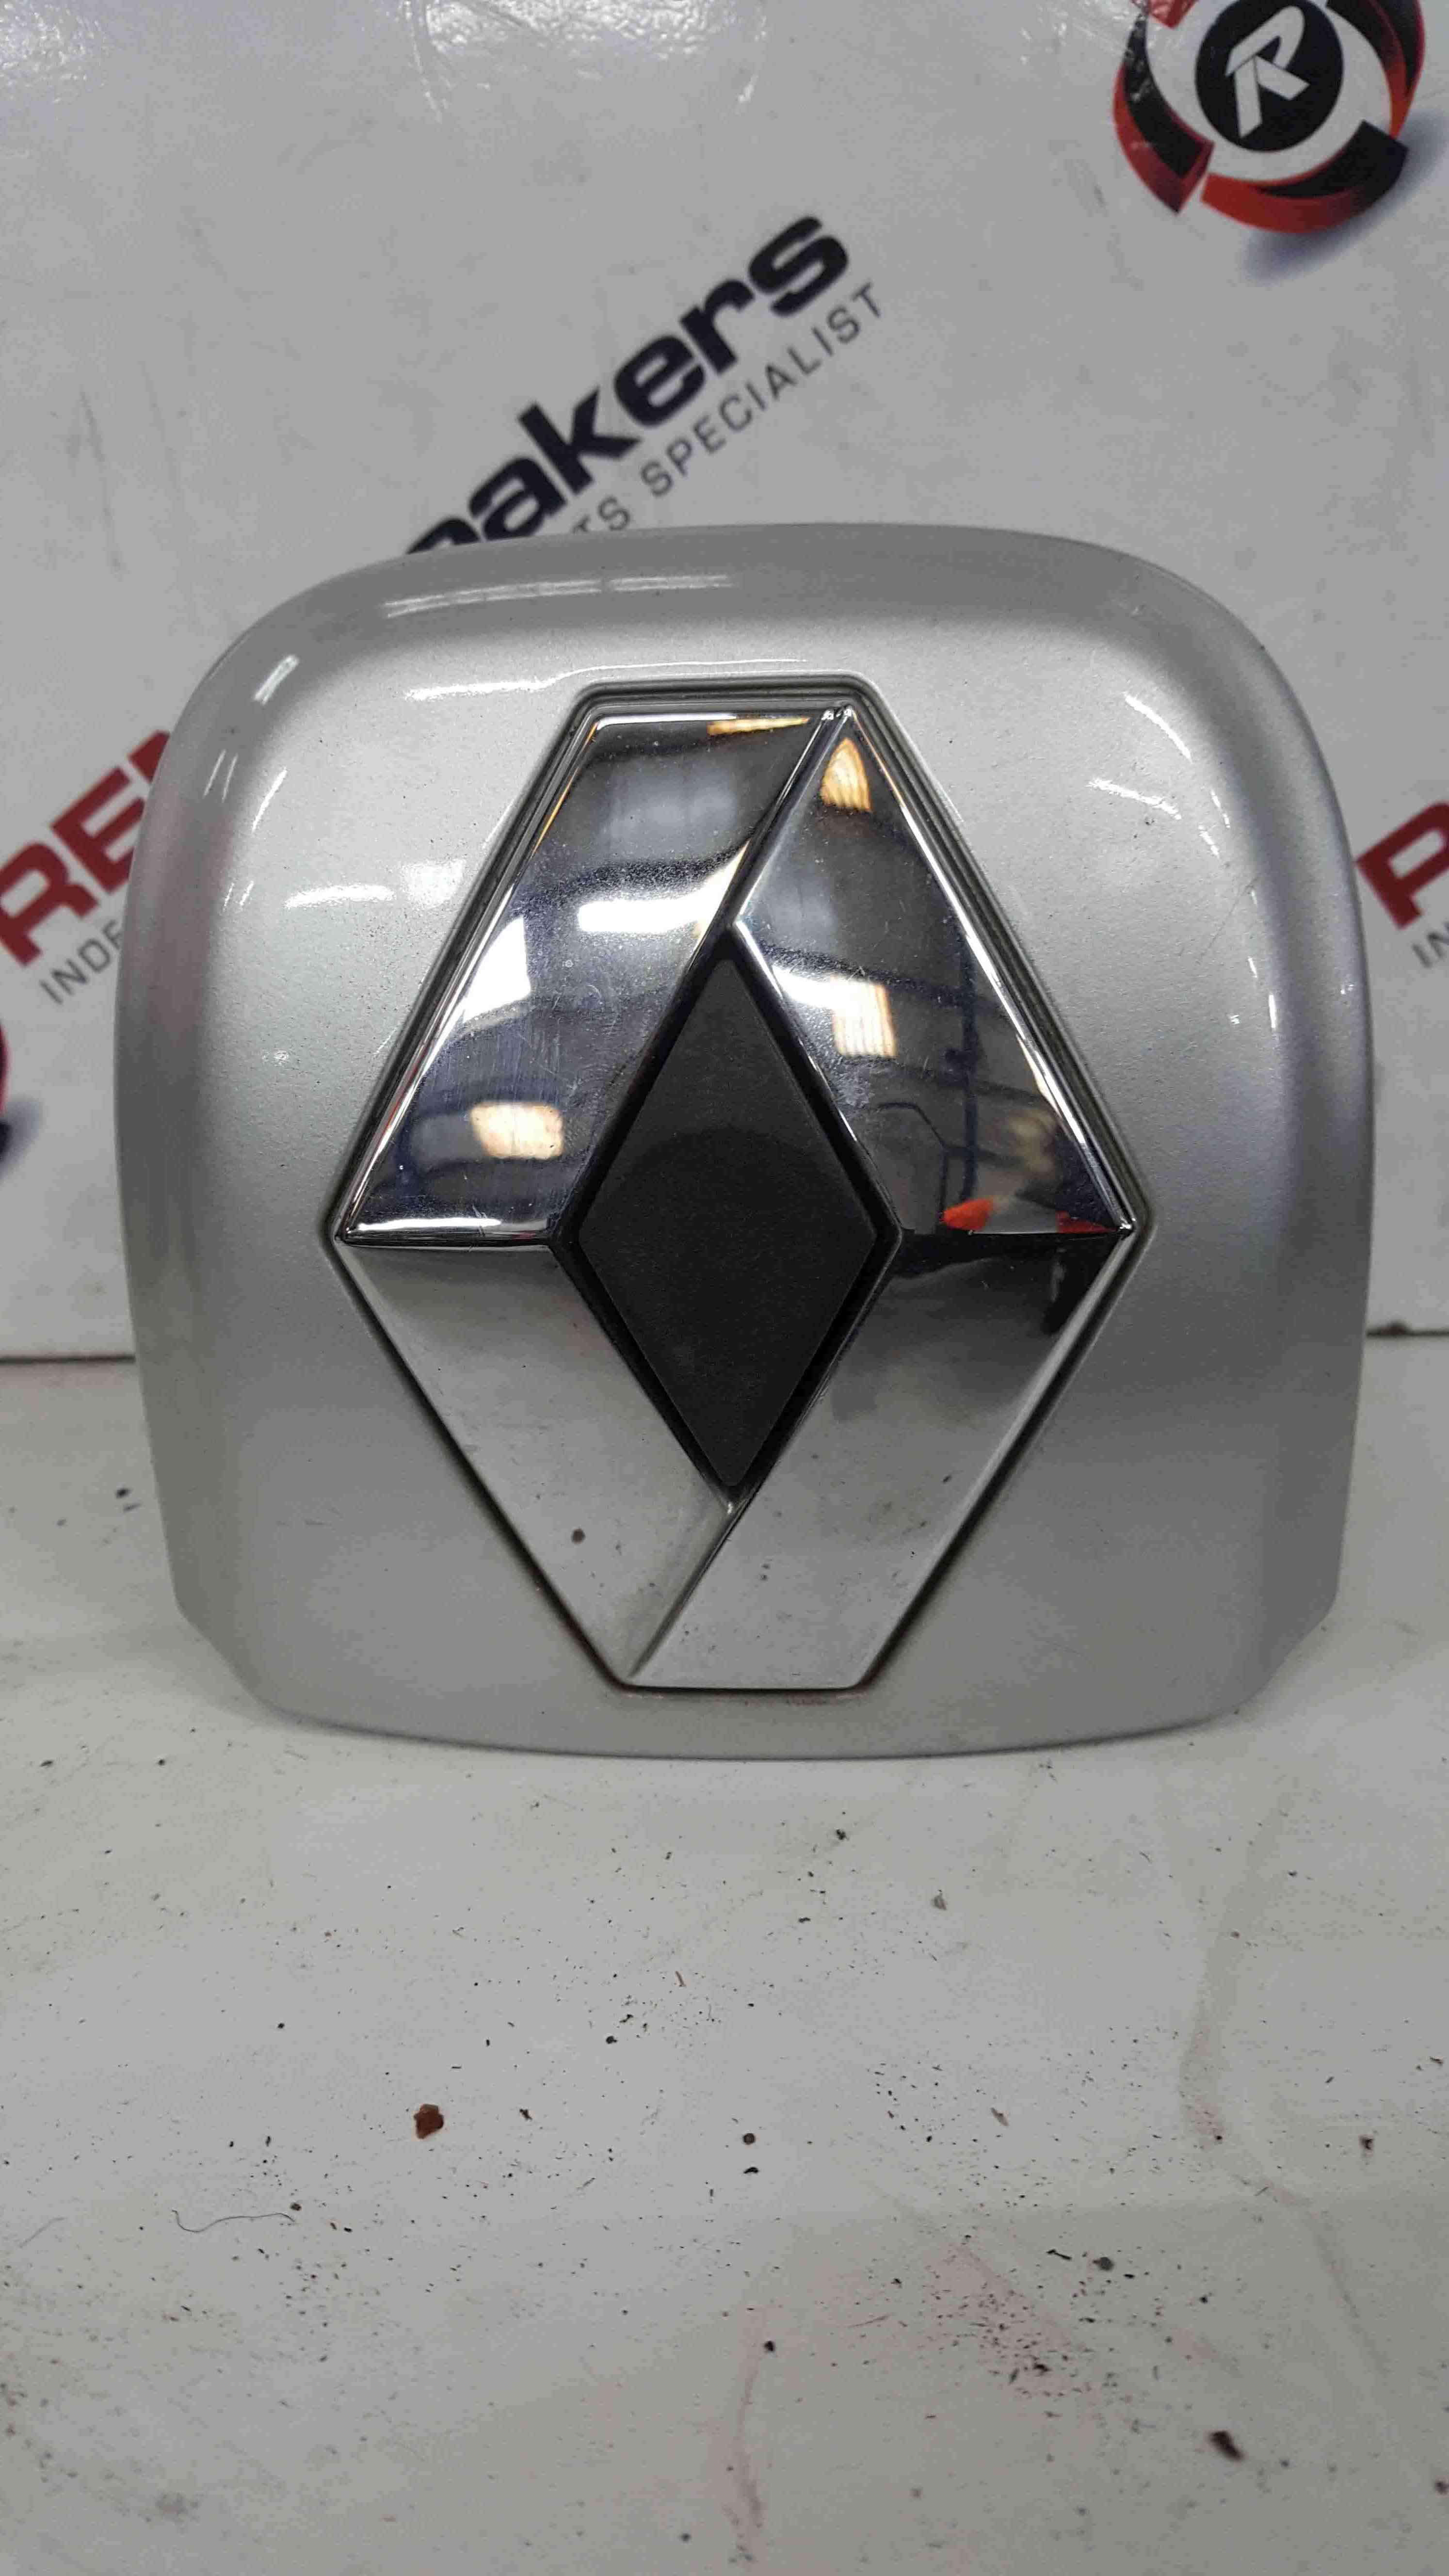 Renault Clio MK2 2001-2006 Rear Boot Button Silver TED69 Diamond